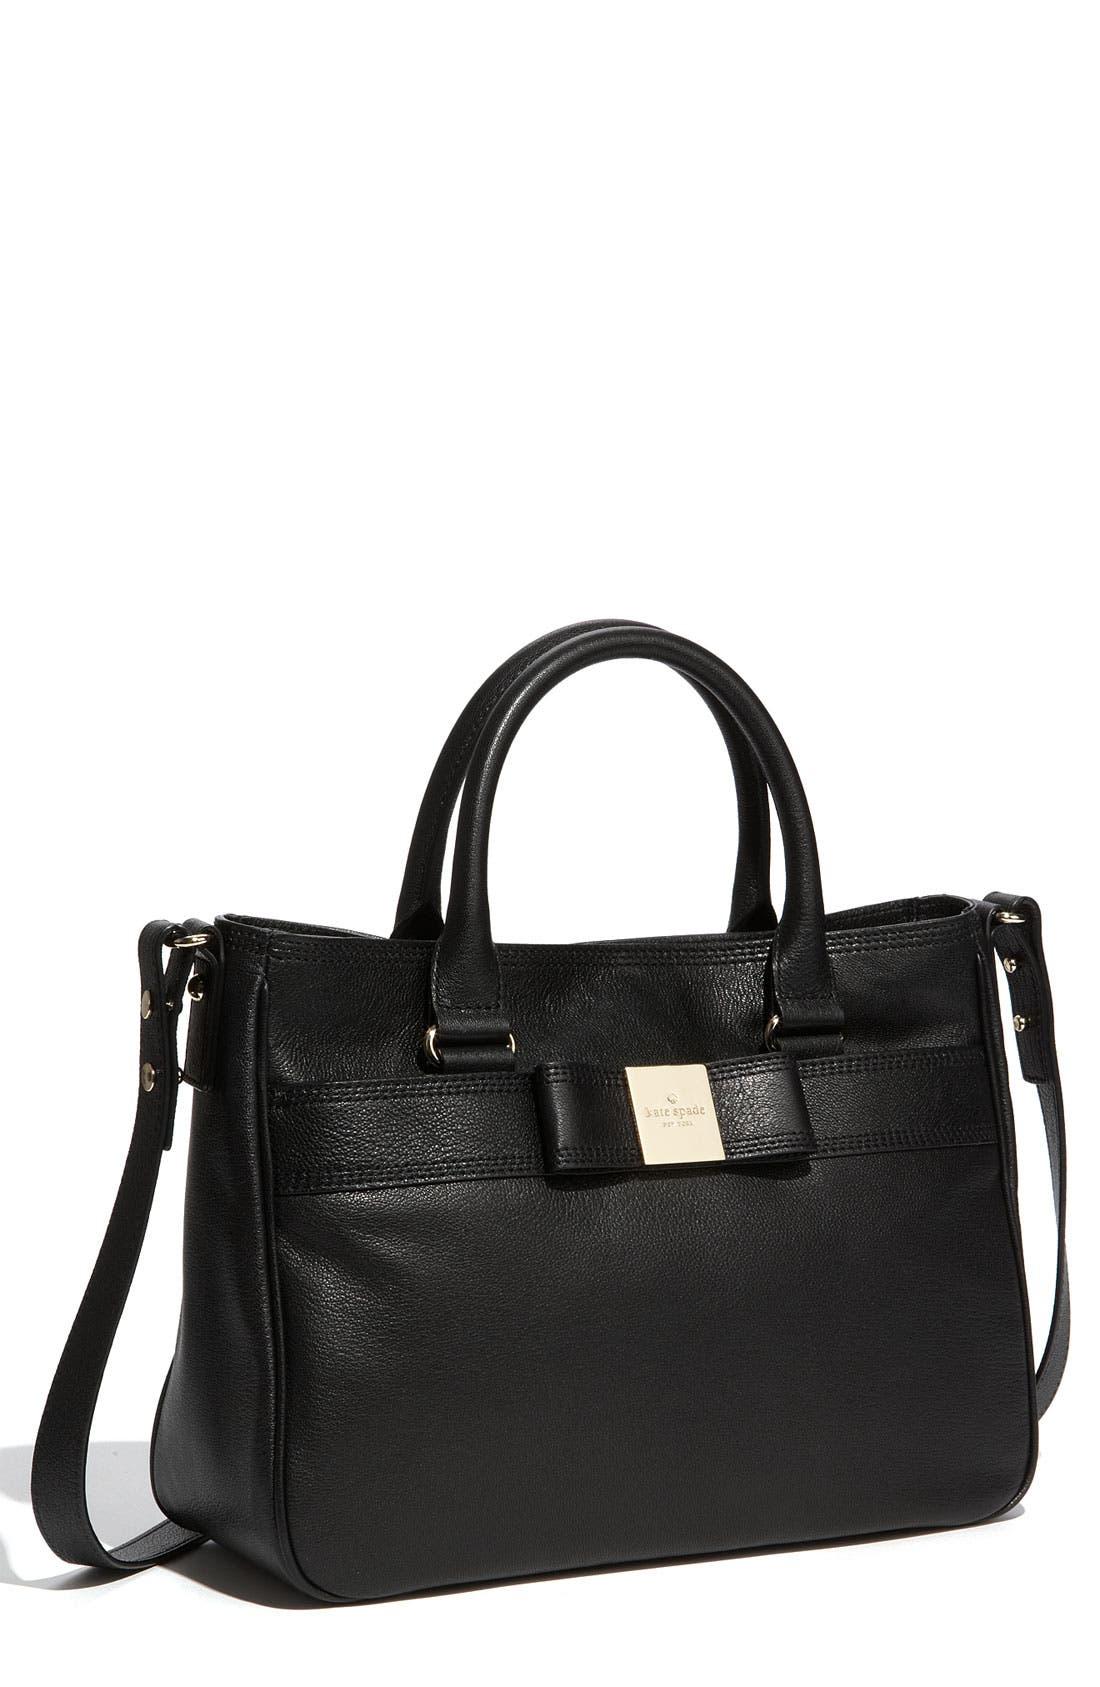 Alternate Image 1 Selected - kate spade new york 'primrose hill - goldie' leather satchel